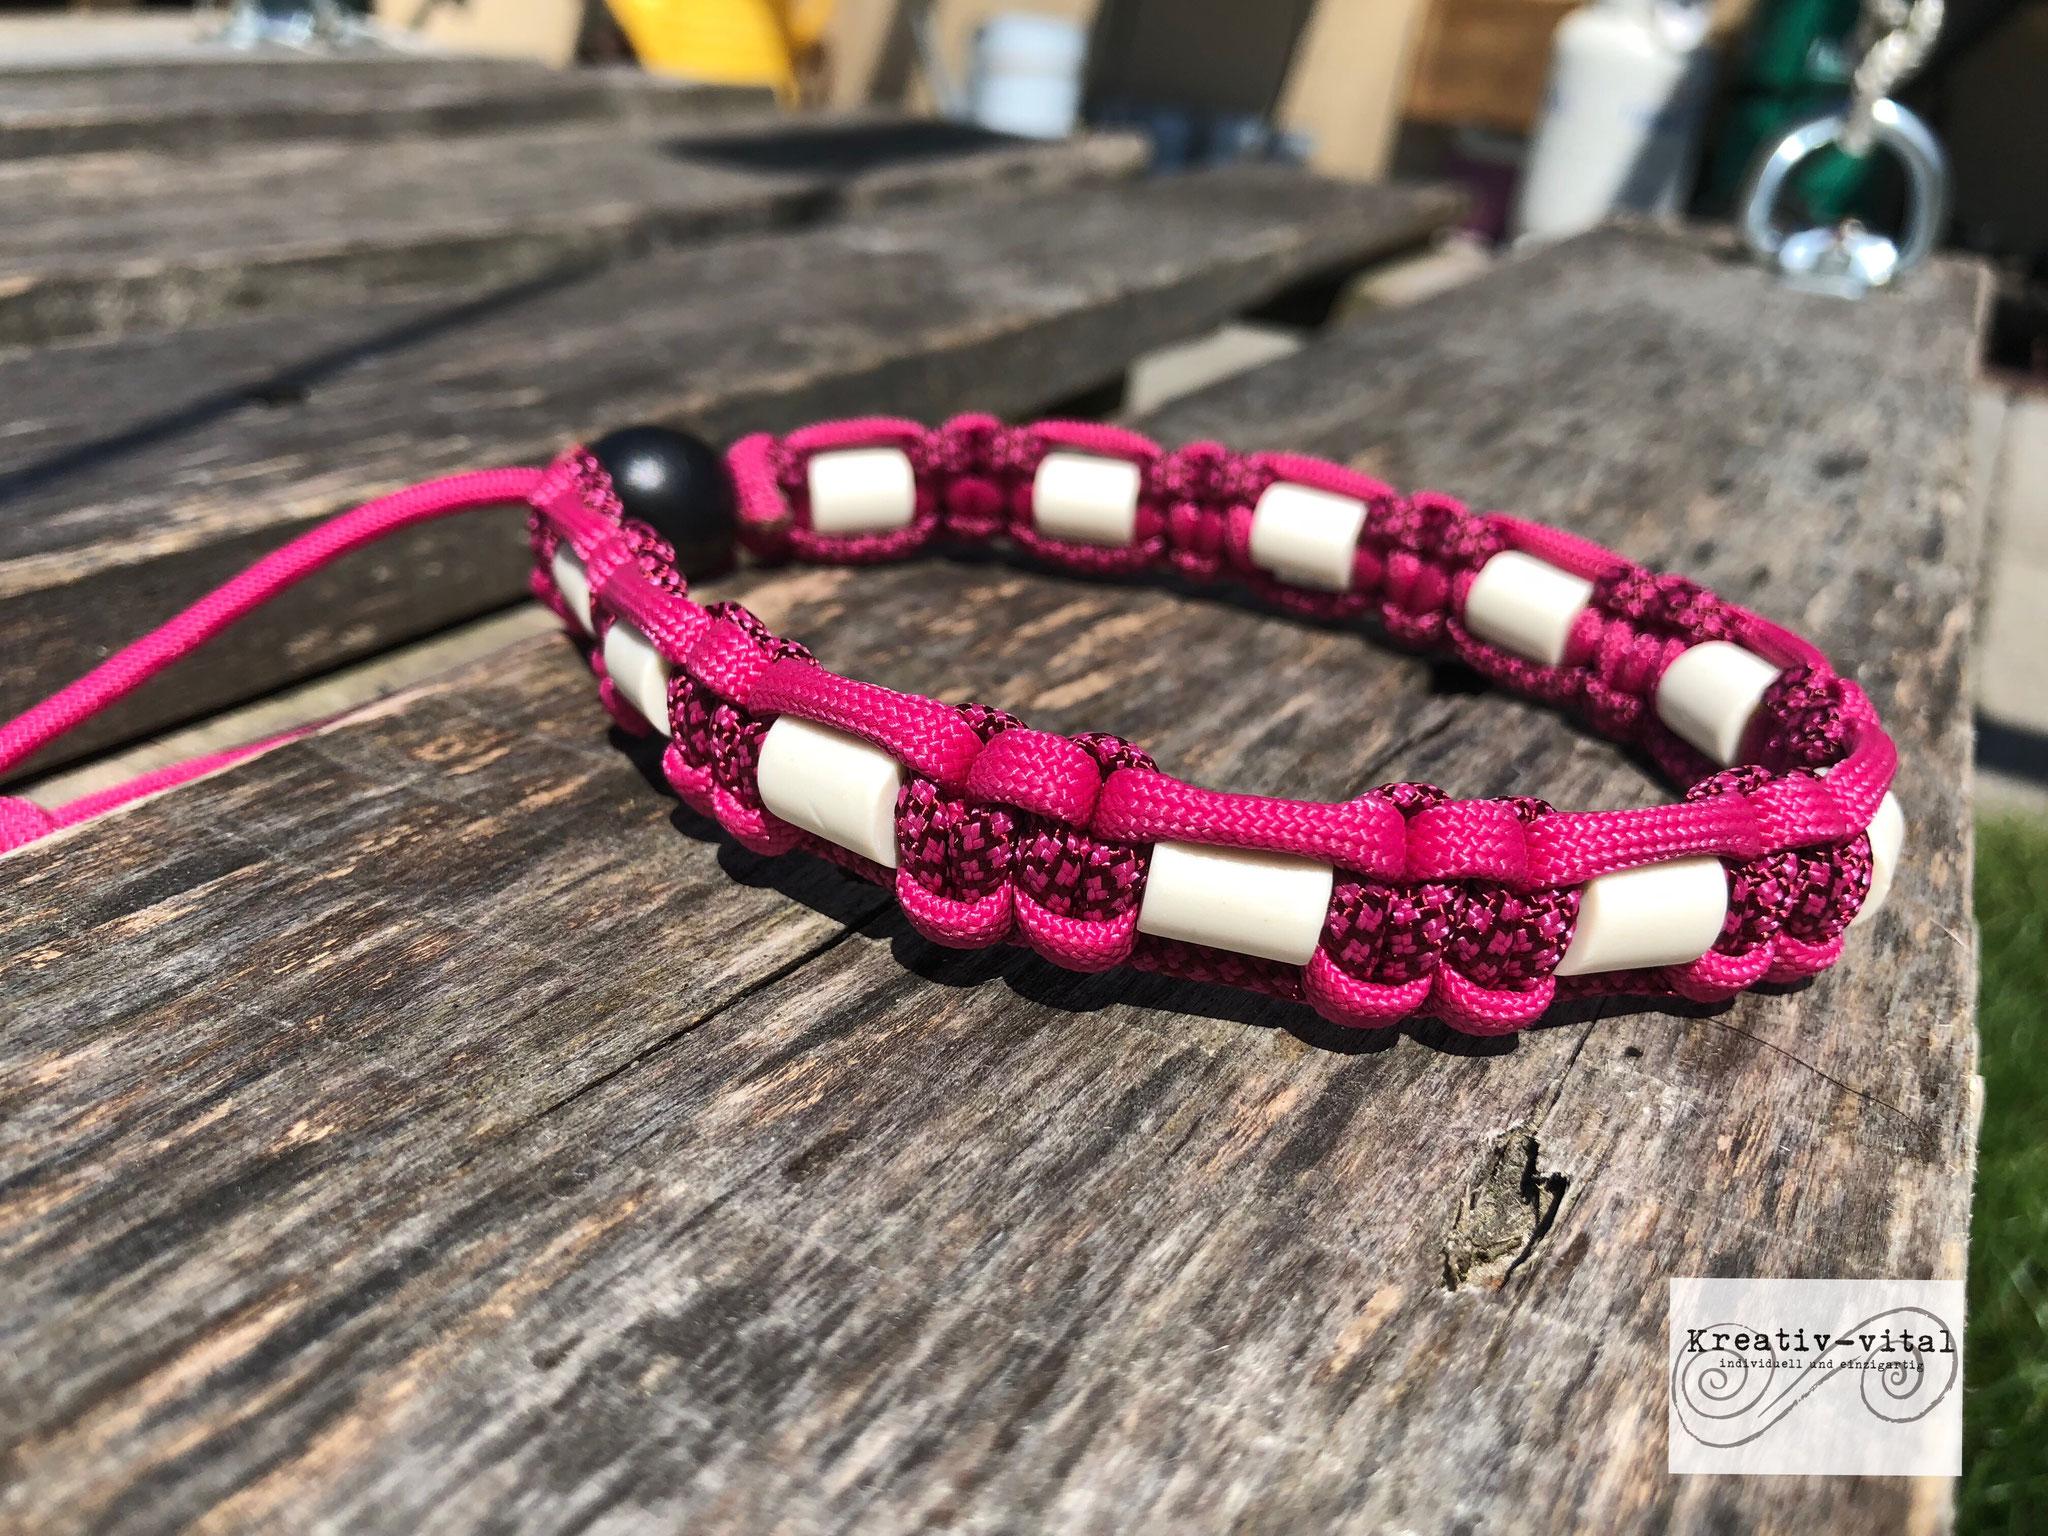 EM Keramik Halsband für Hund/Katze 46-50cm Halsumfang Burgundy/Fuchsia